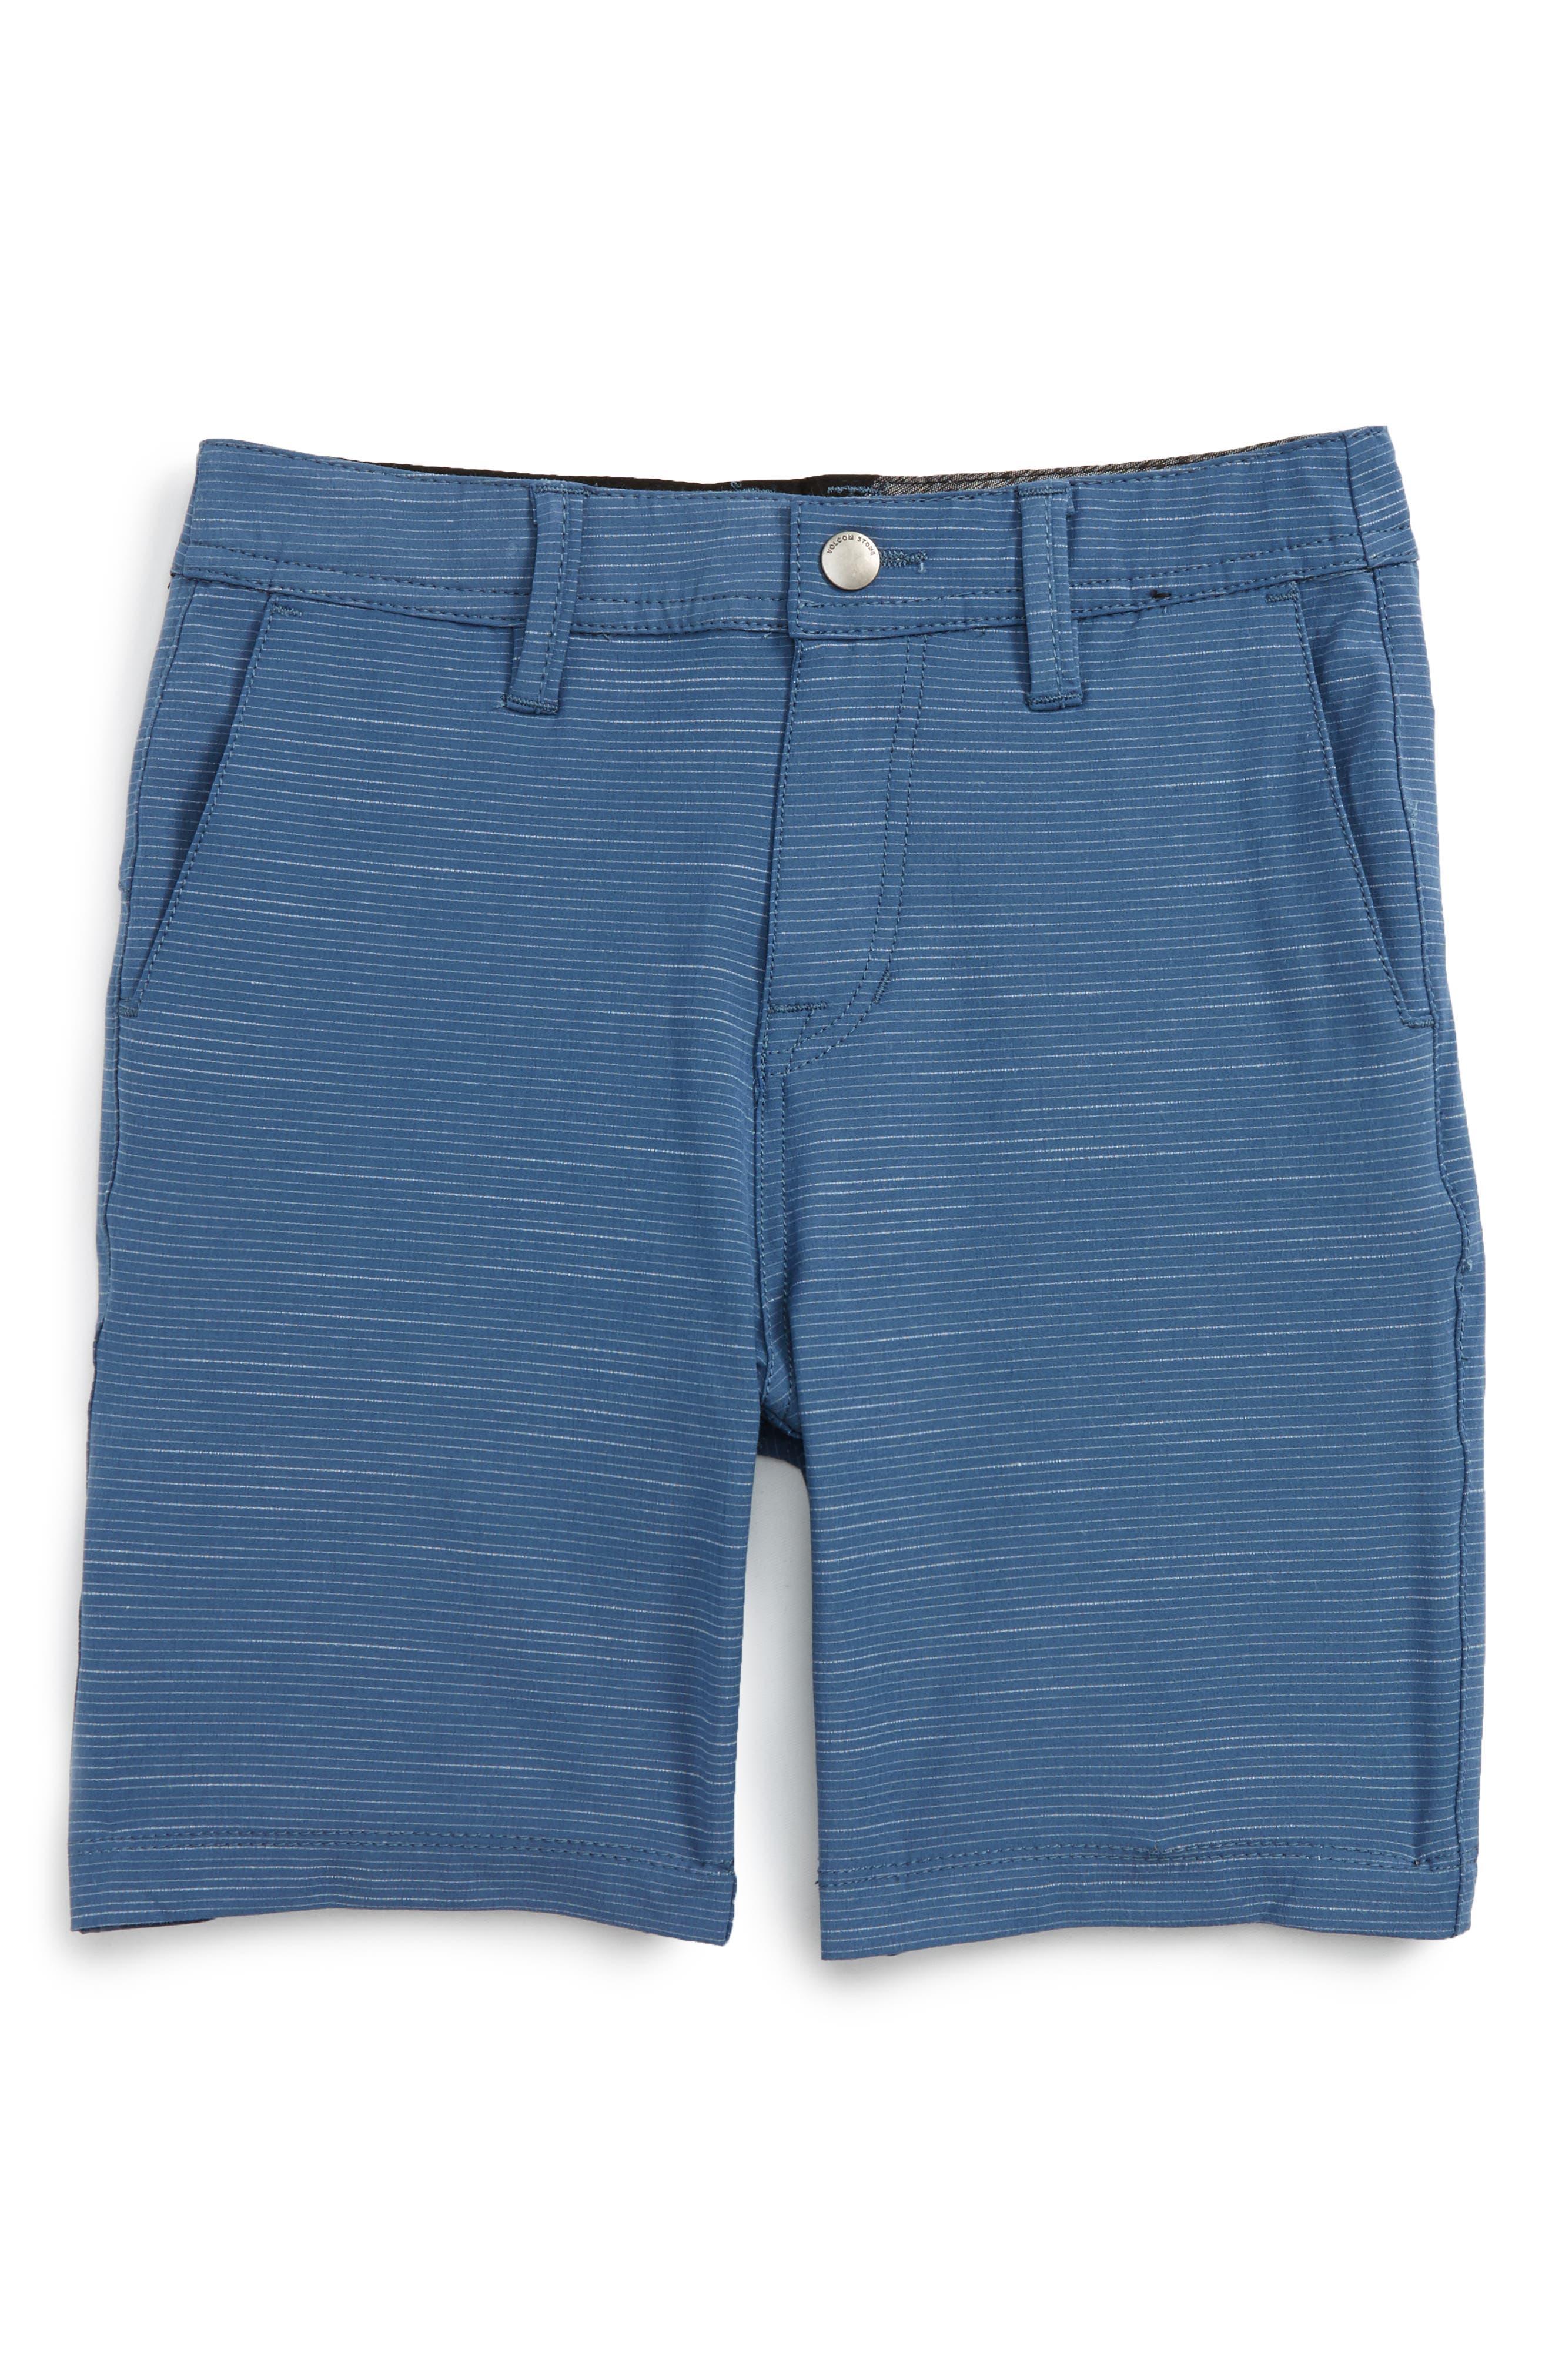 Main Image - Volcom Surf N' Turf Hybrid Shorts (Toddler Boys & Little Boys)